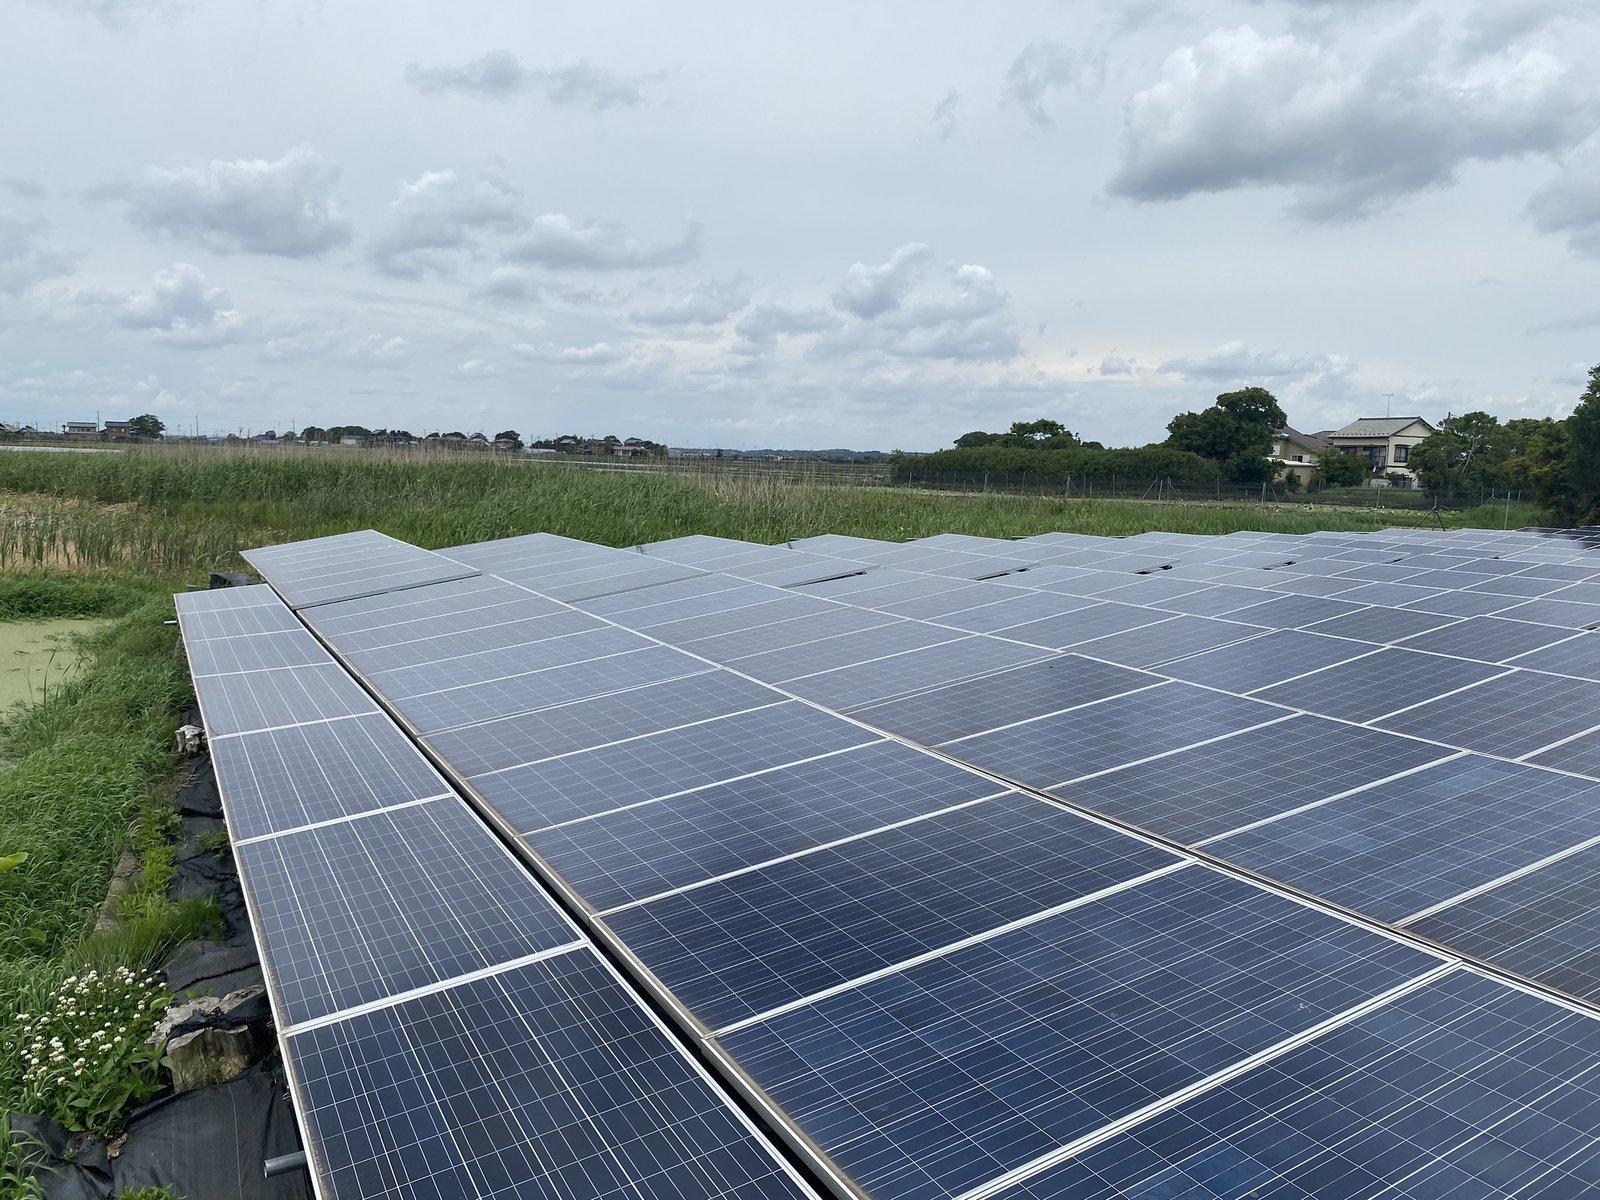 「SOL SELL 再生可能エネルギープロジェクト #001」の対象太陽光発電所